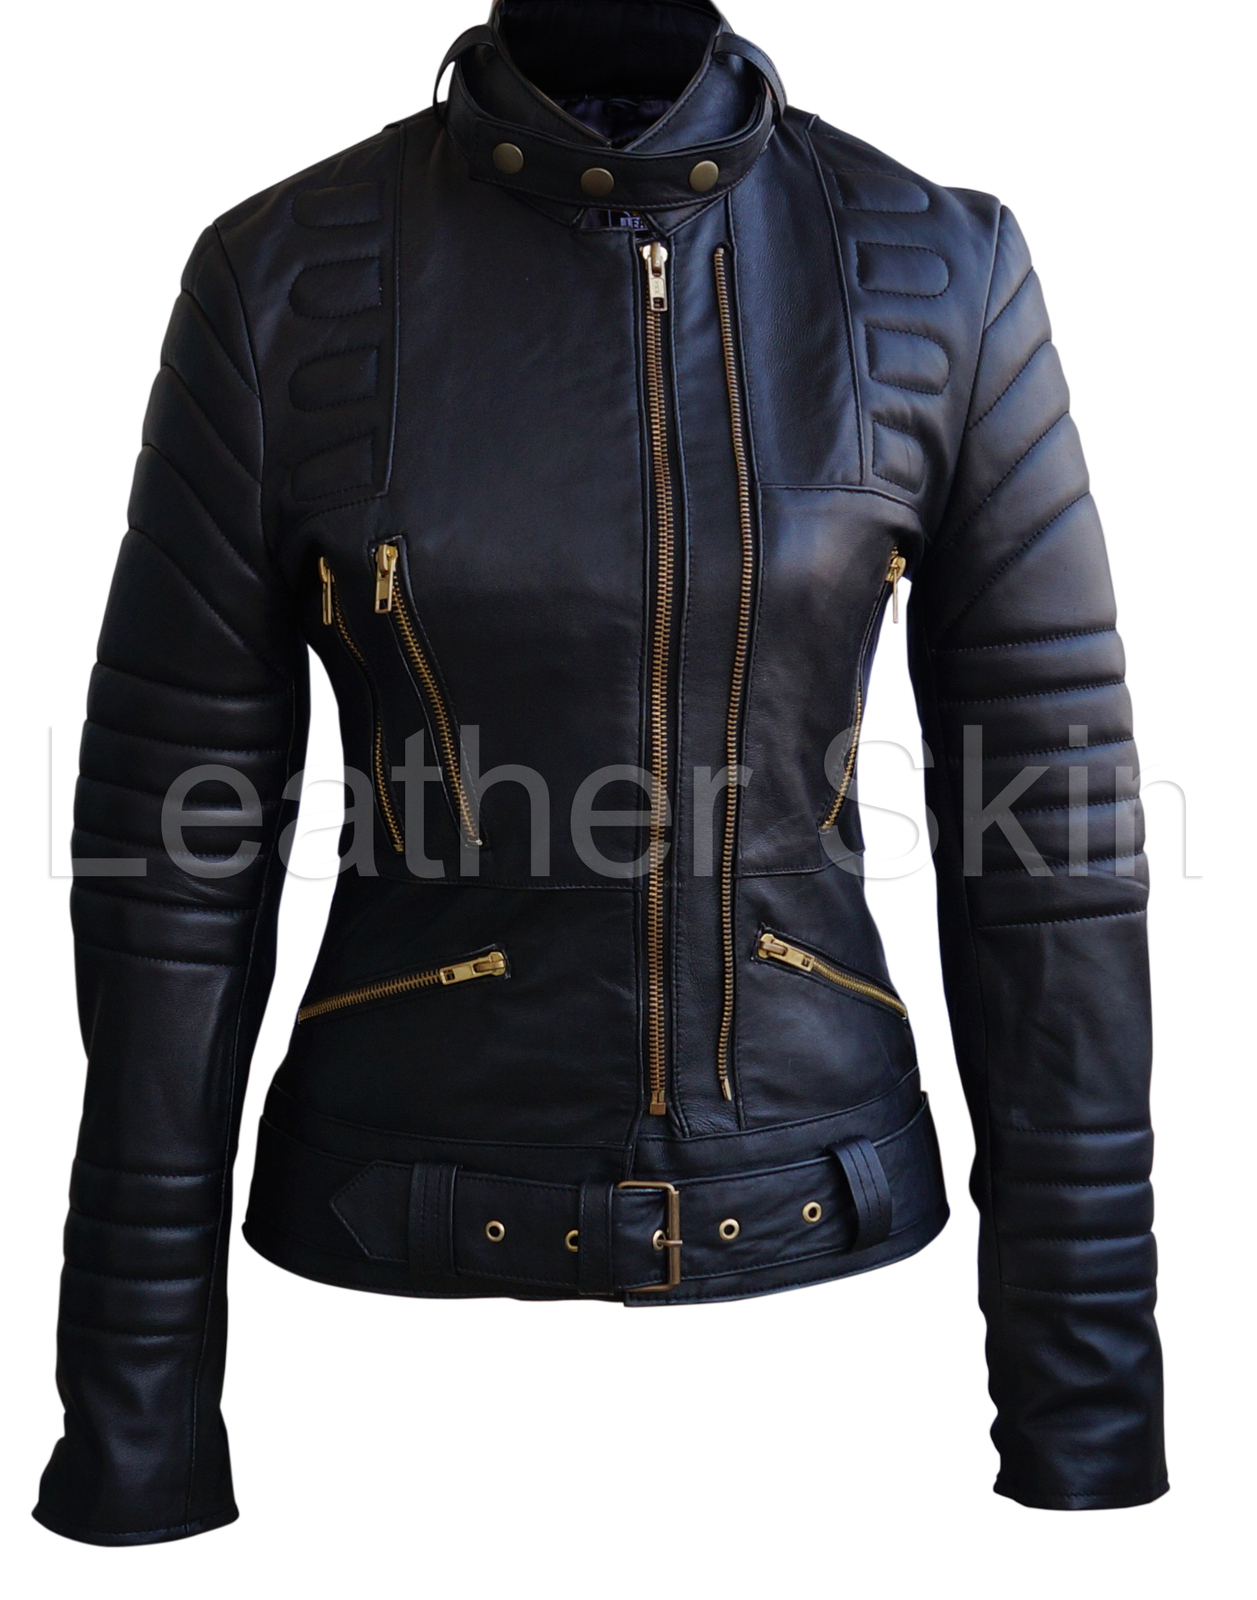 leather skin women black brando padded and 50 similar items. Black Bedroom Furniture Sets. Home Design Ideas